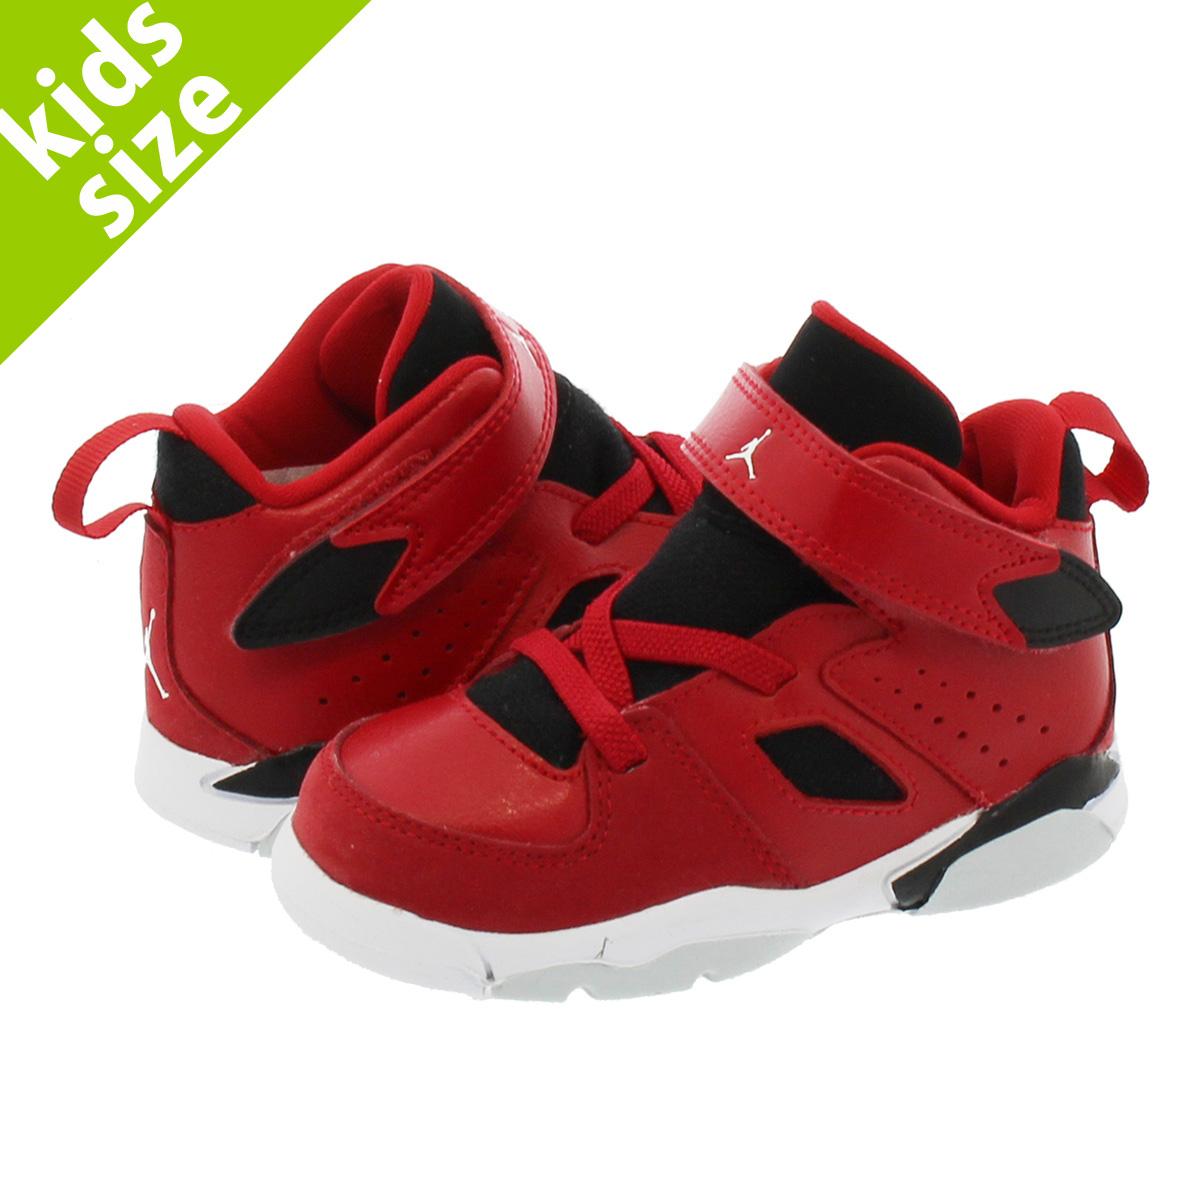 many fashionable uk cheap sale new lower prices NIKE JORDAN FLIGHT CLUB 91 TD Nike Jordan flight club 91 TD RED/BLACK/WHITE